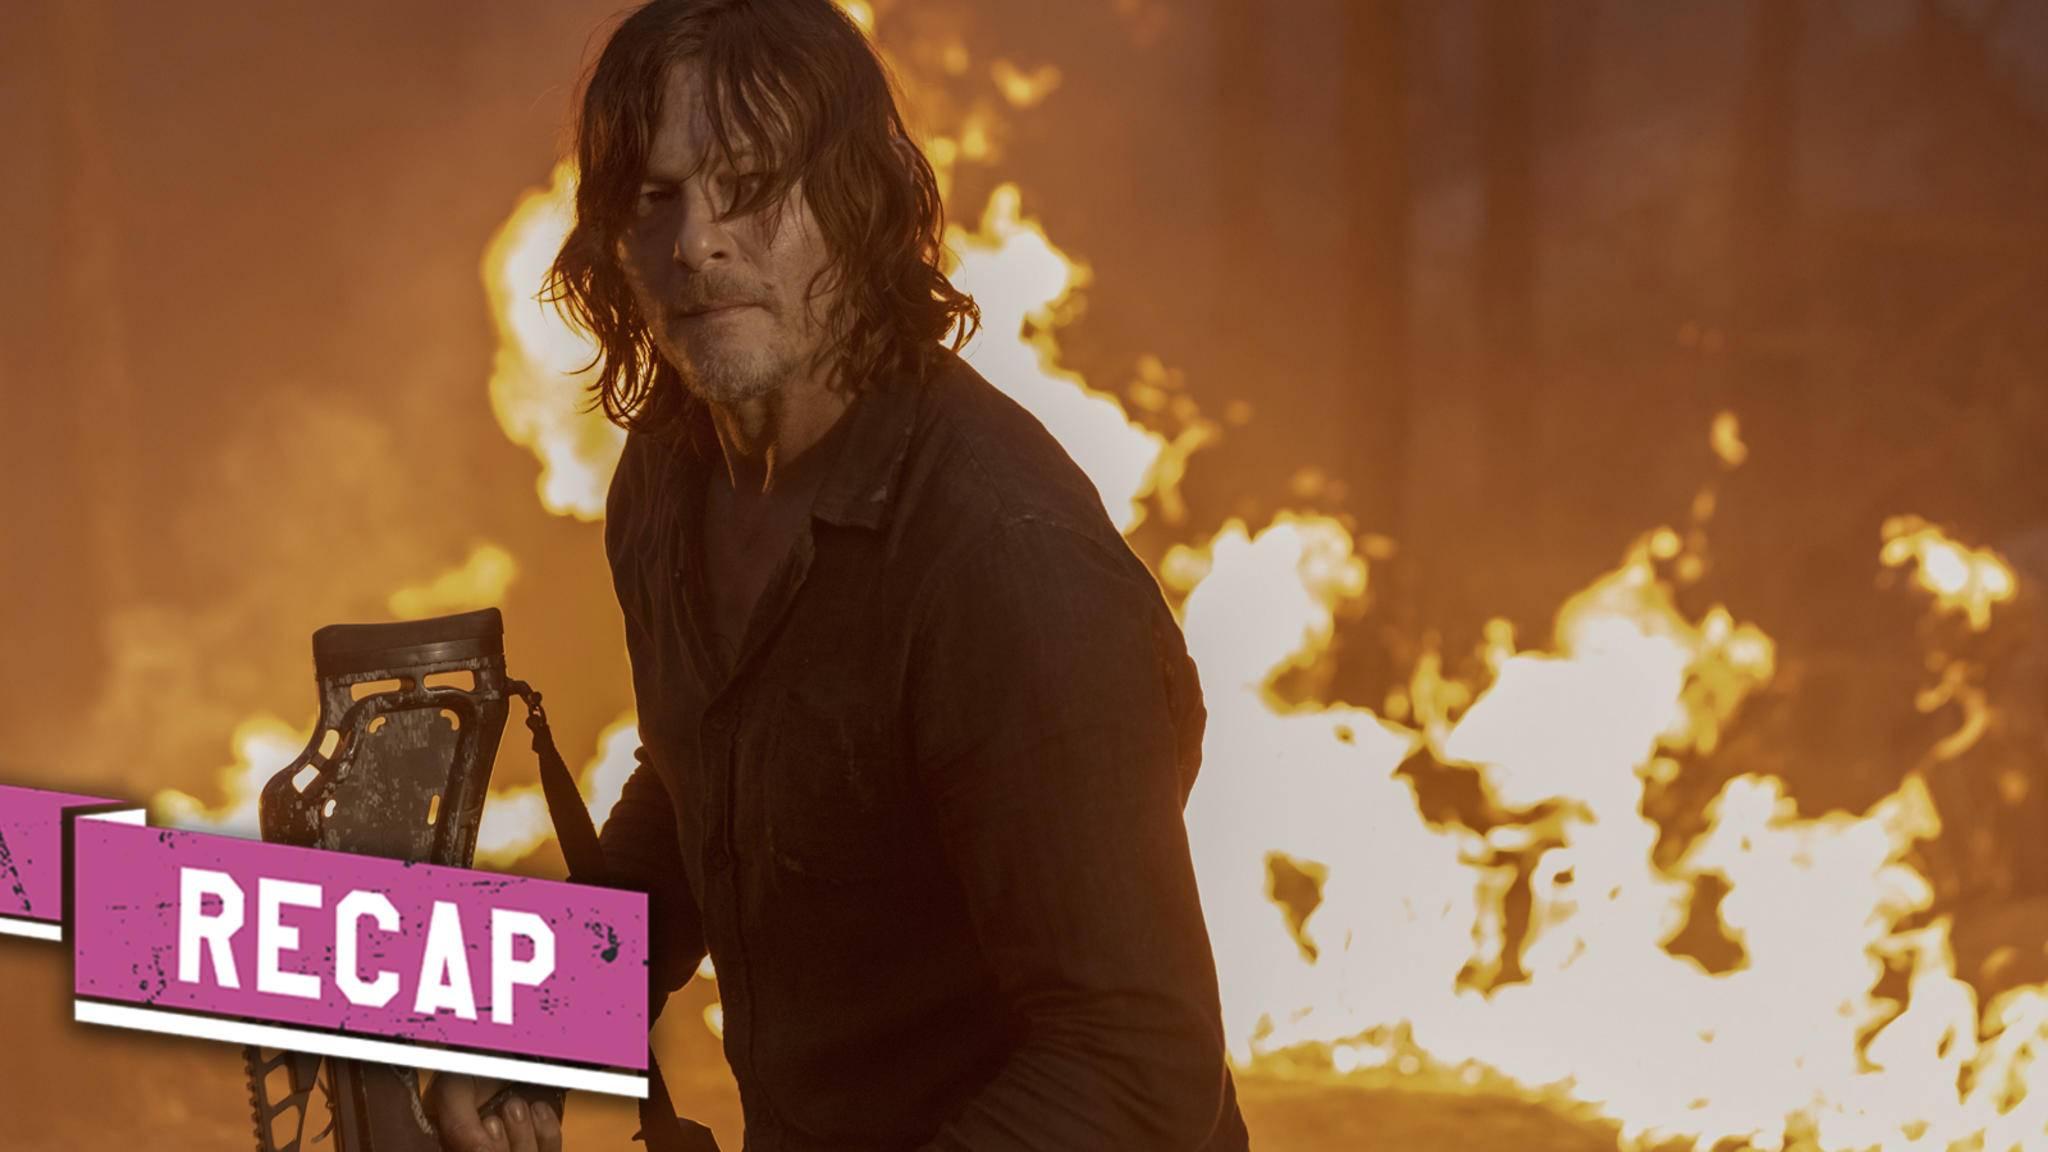 The Walking Dead-S10E01-Daryl-Jackson Lee Davis-AMC-Teaserbild